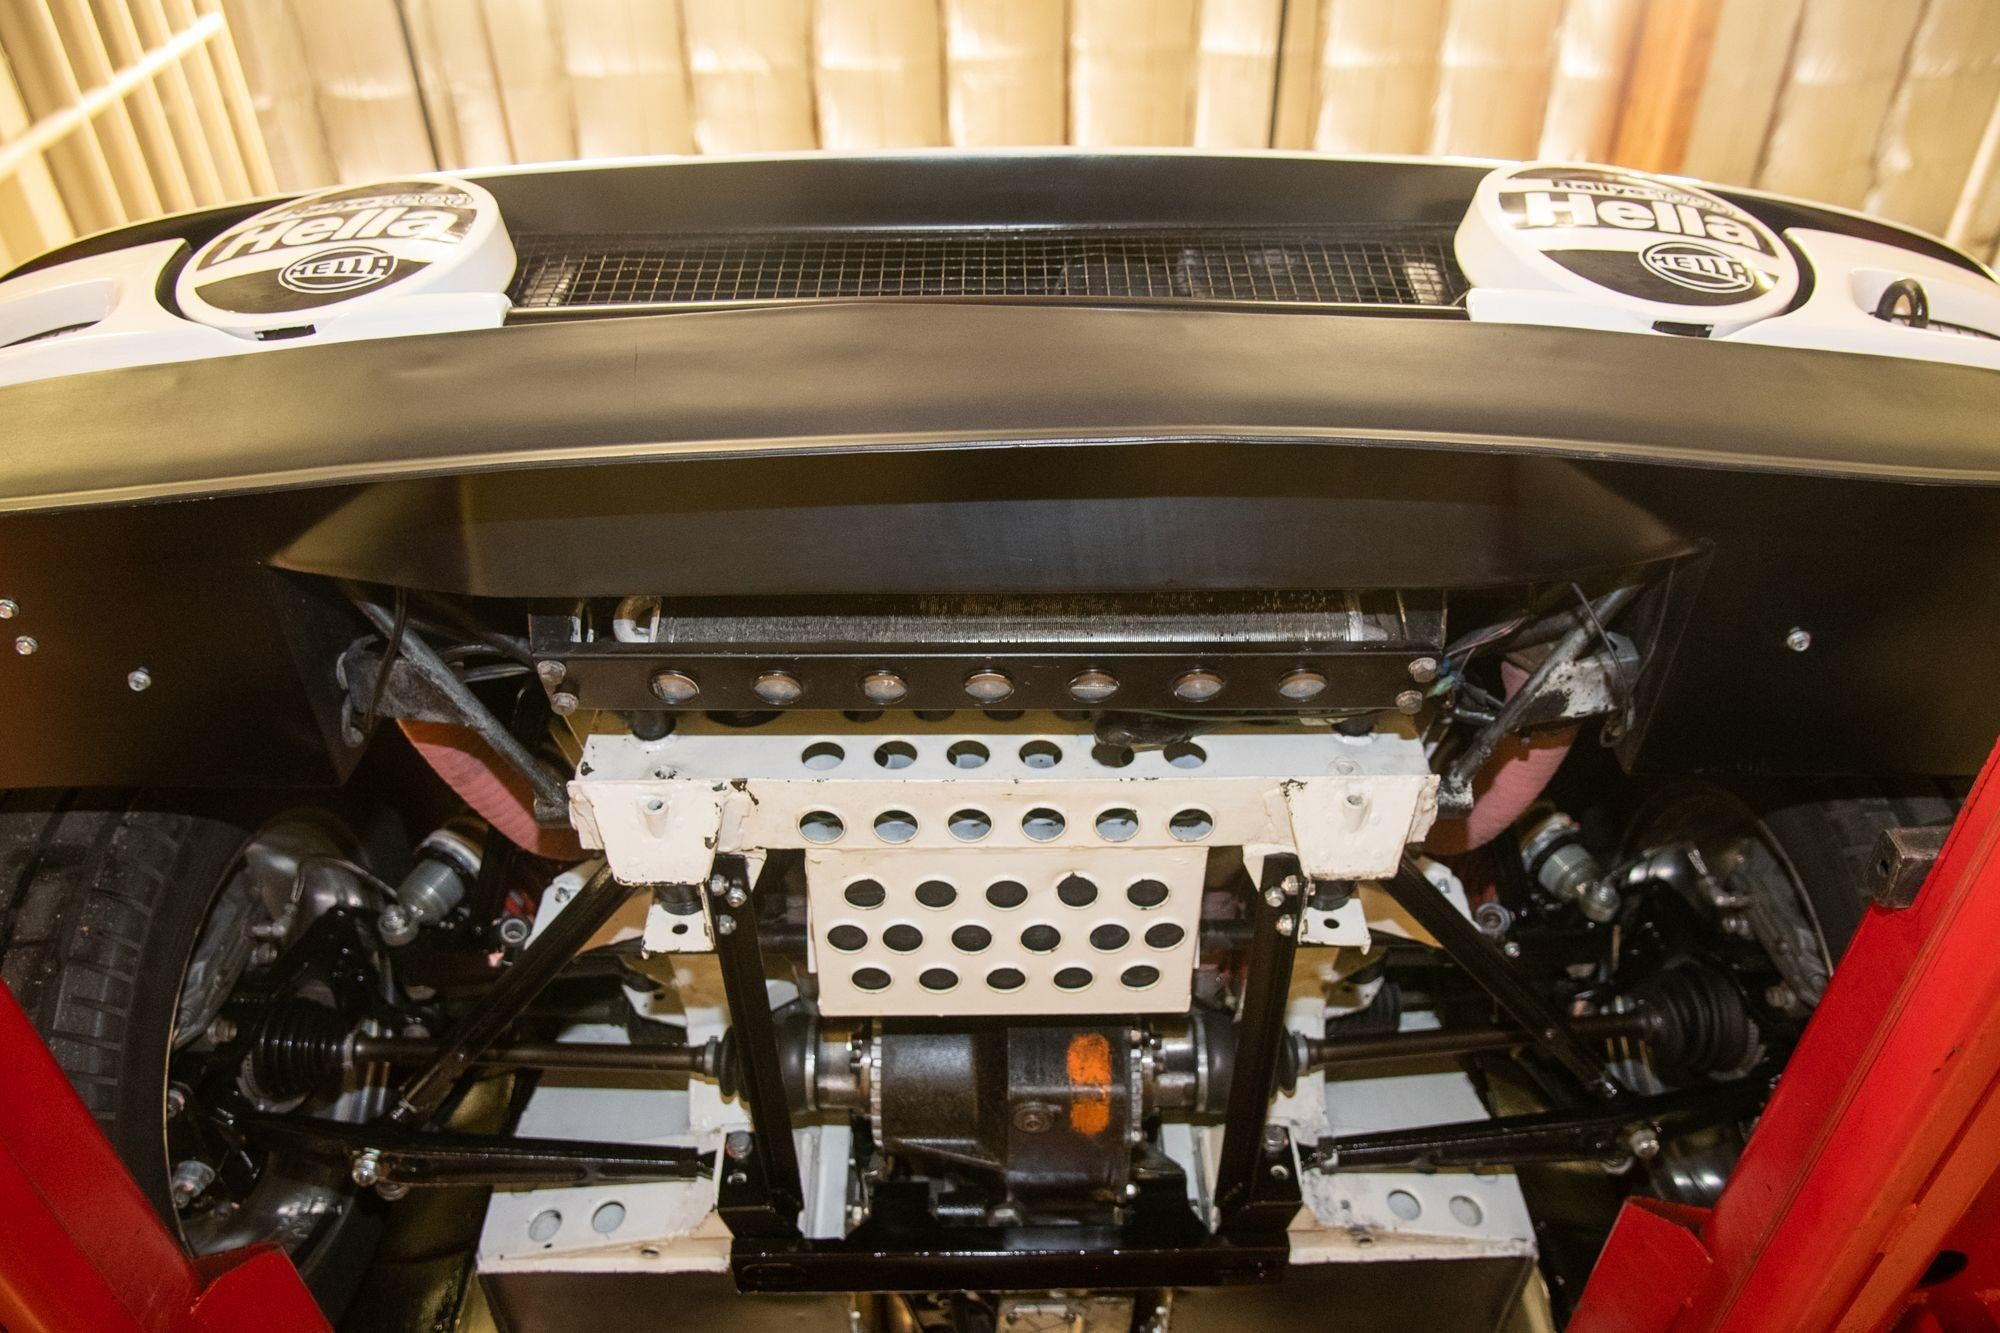 Ультра-редкий гоночный Ford RS200 Evolution из 1980-х